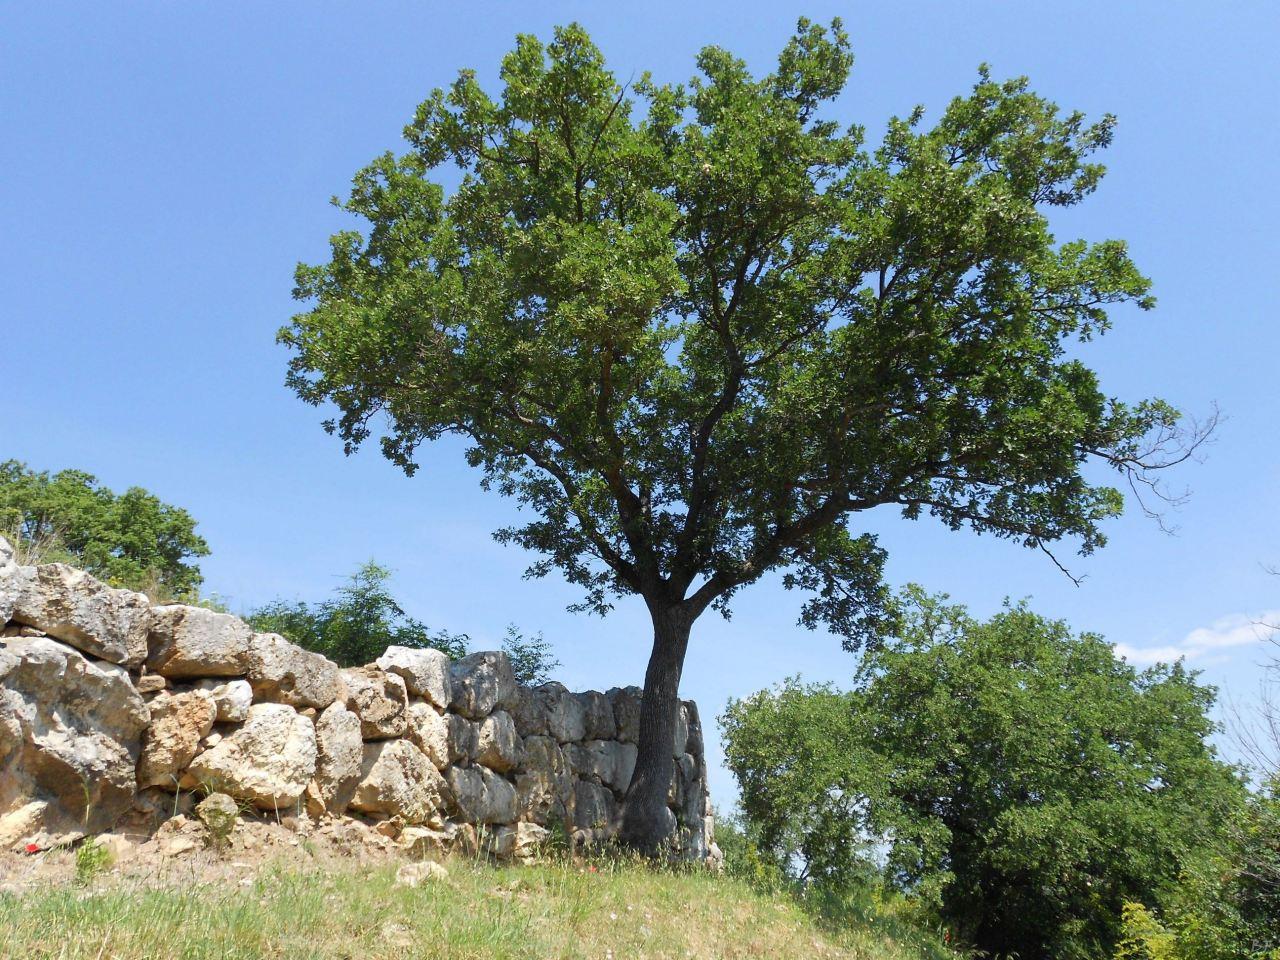 Roselle-Mura-Megalitiche-Roselle-Grosseto-Toscana-Italia-2